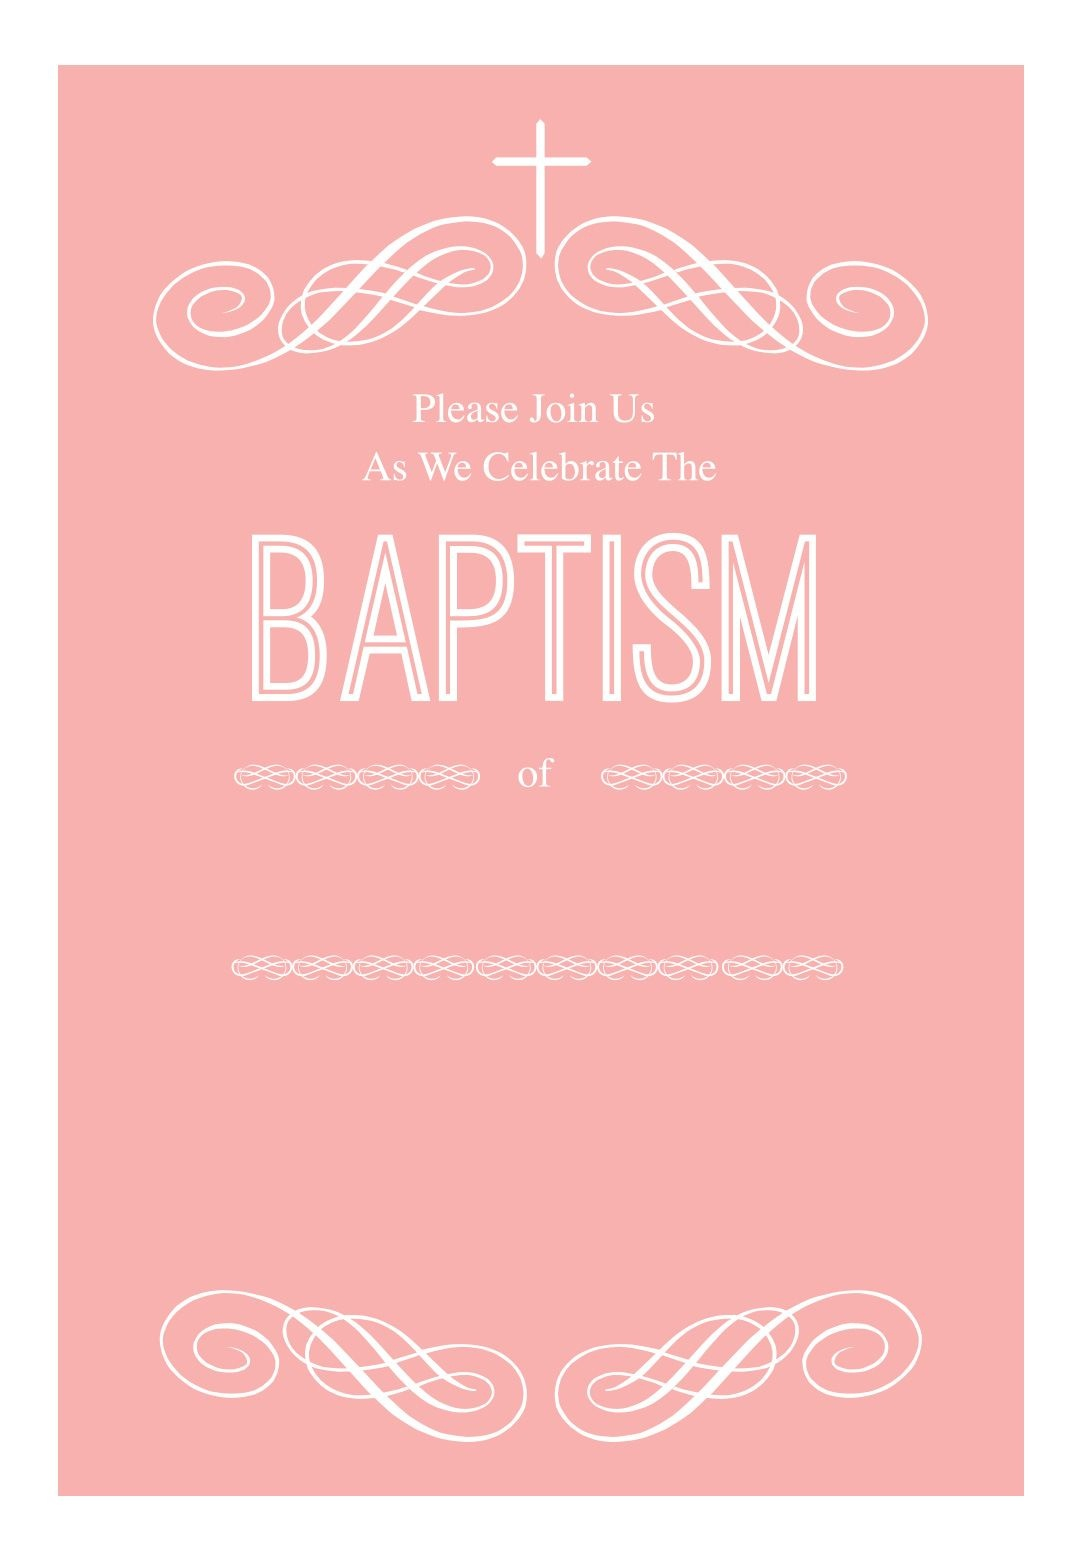 Pink Decorations - Free Printable Baptism & Christening Invitation - Free Printable Baptism Invitations